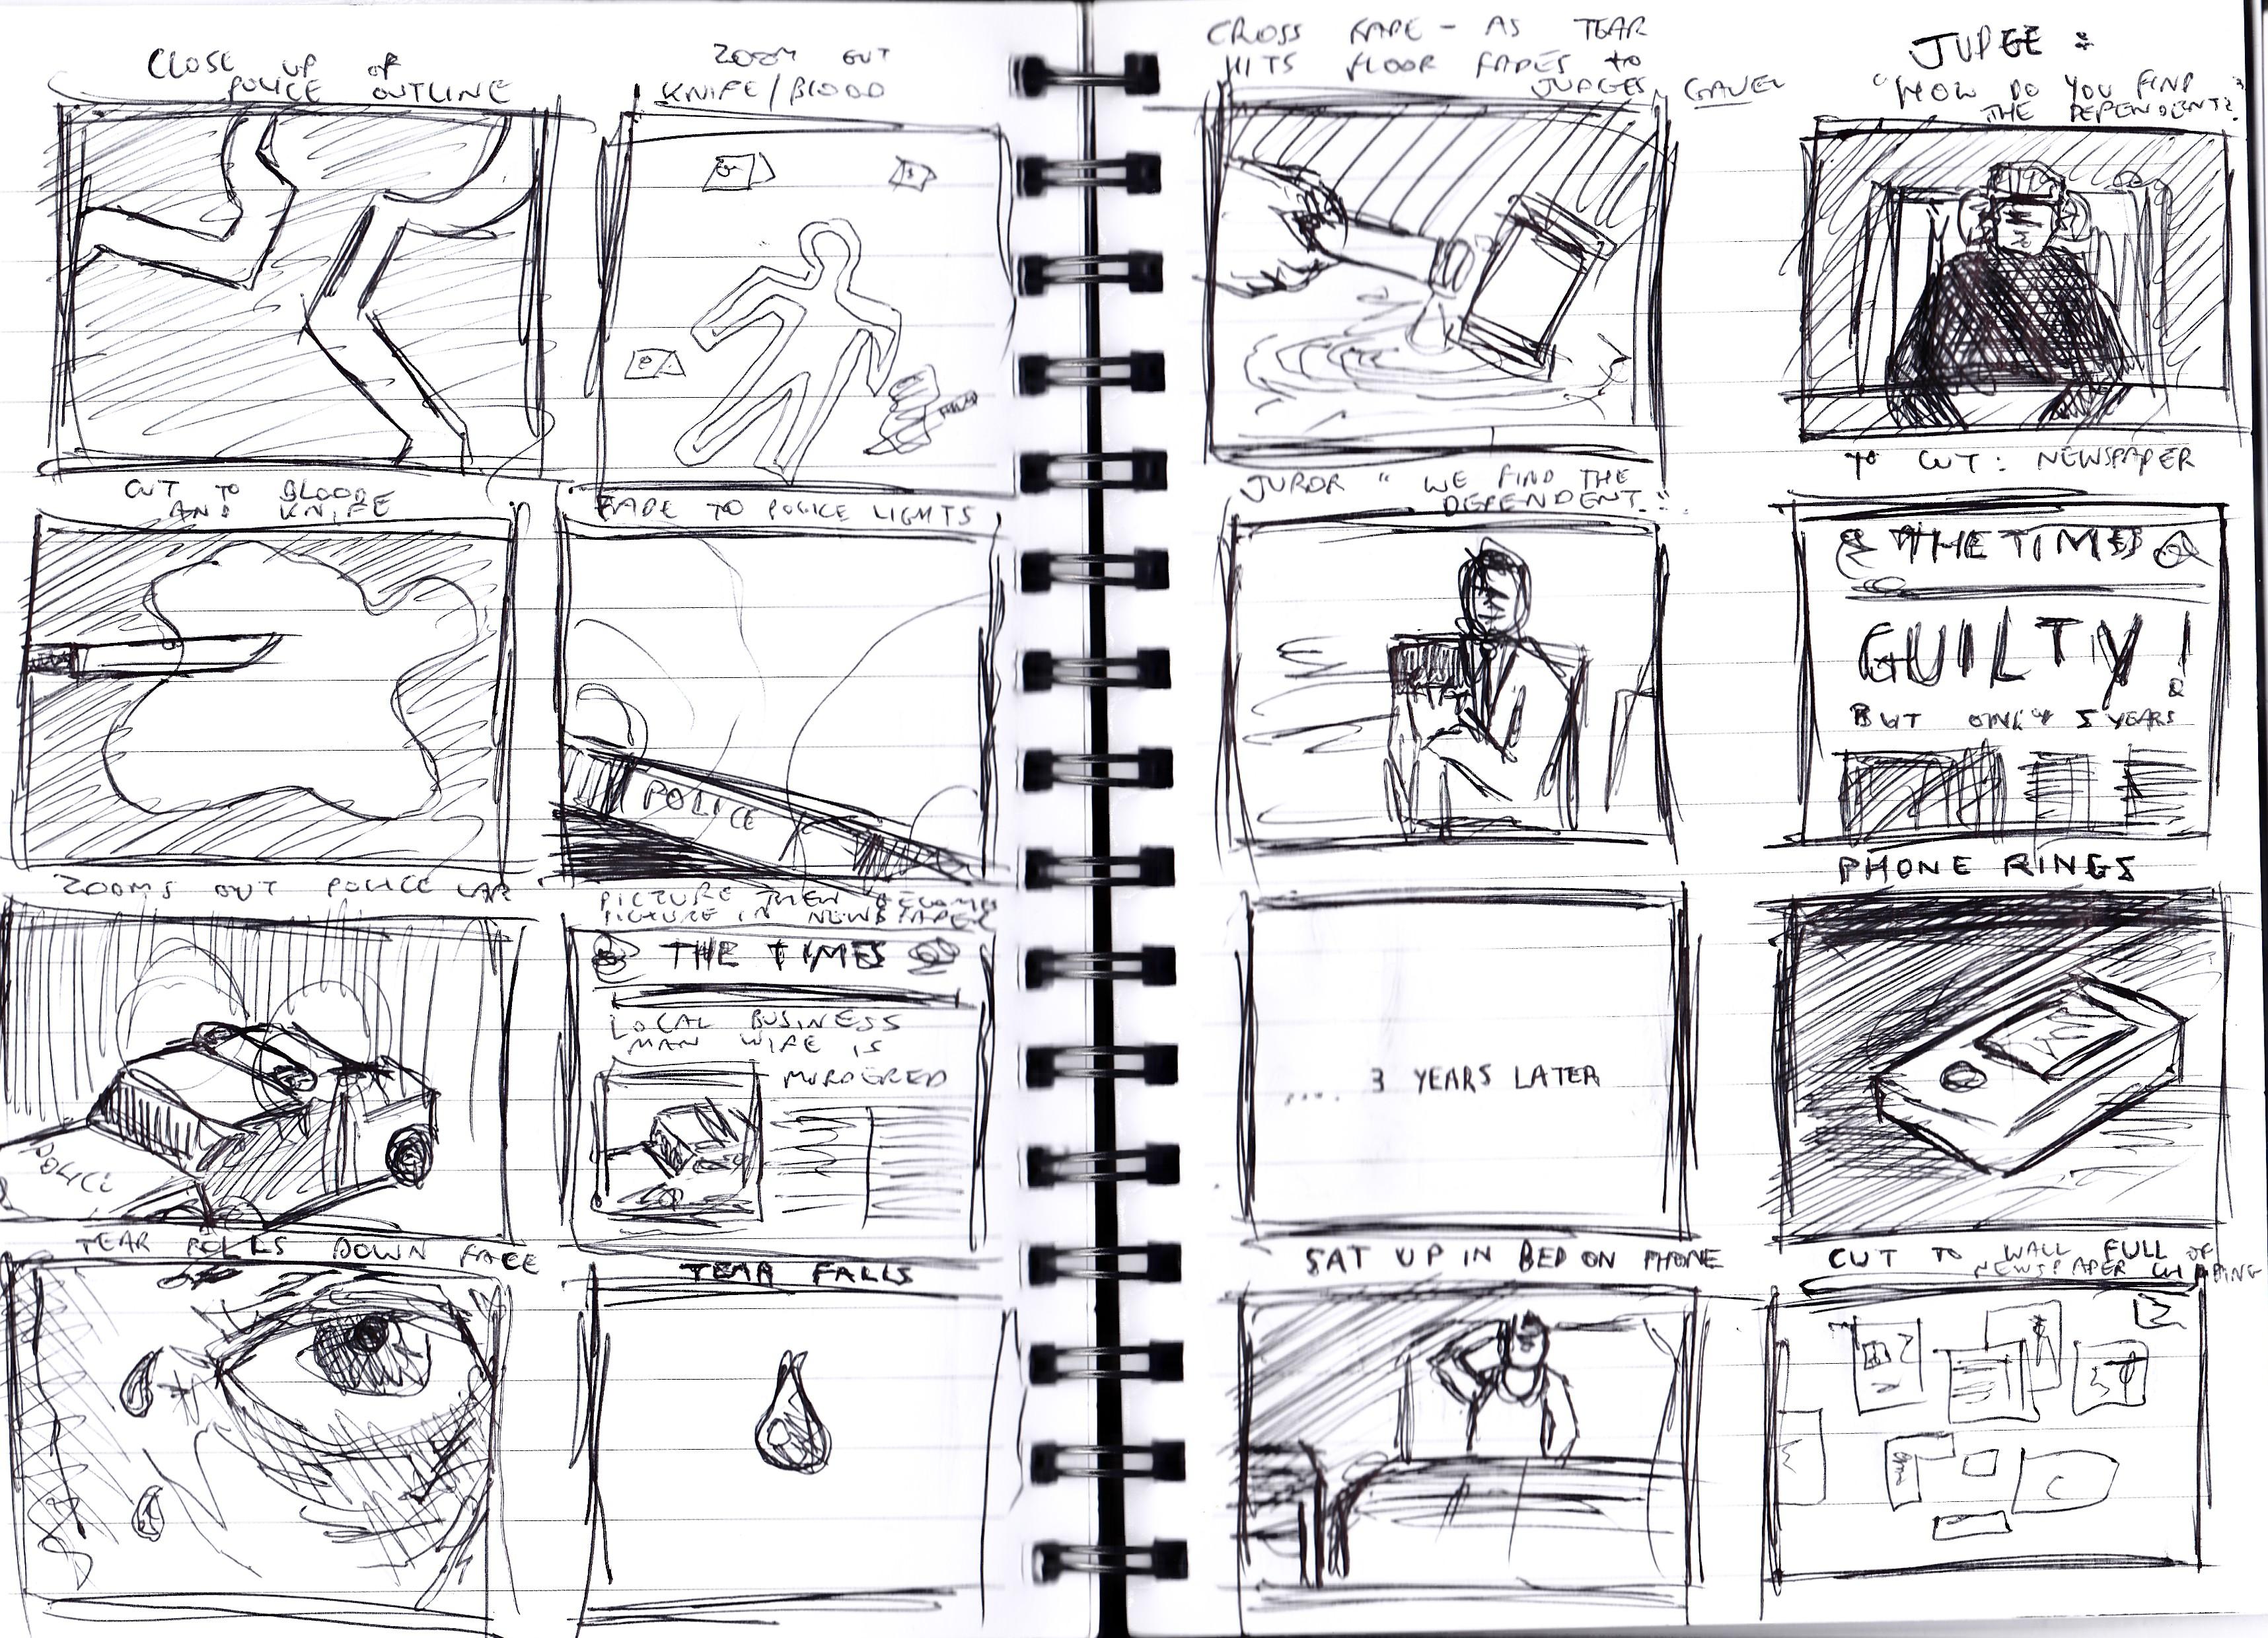 FICTION PROJECT – ROUGH STORYBOARD | David Kirk